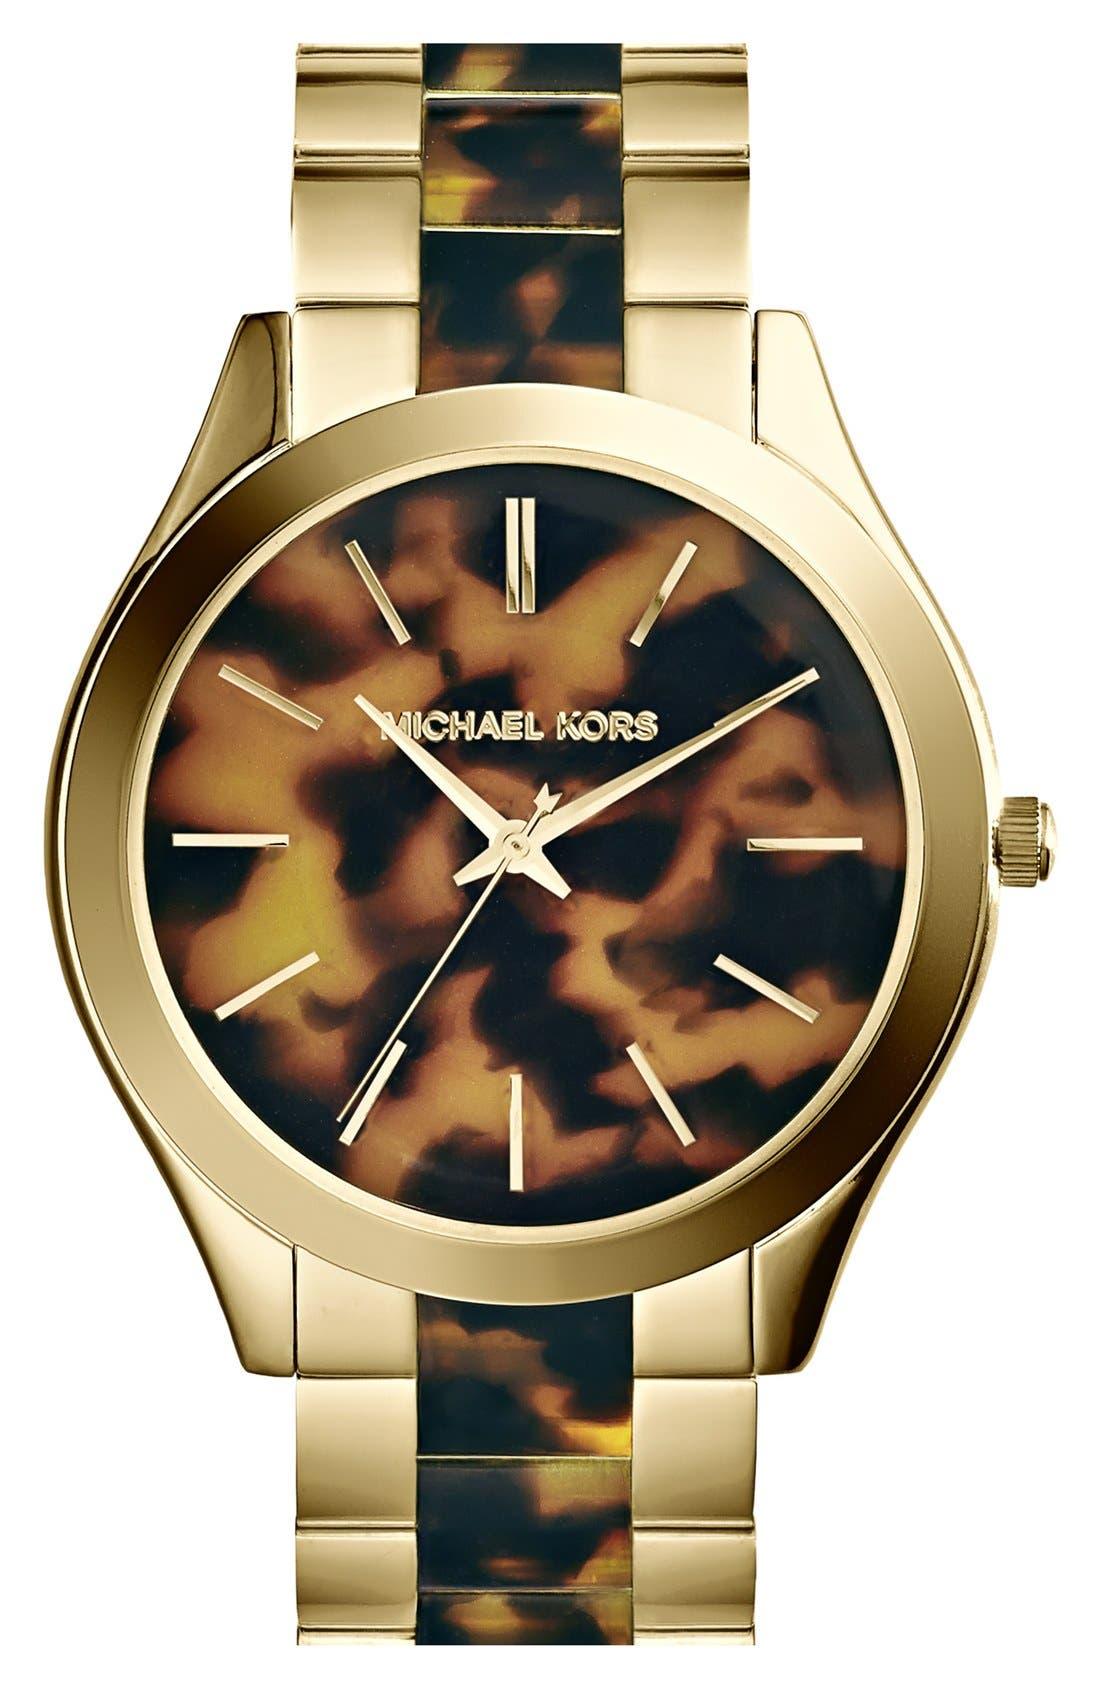 Michael Kors 'Slim Runway' Round Bracelet Watch, 42mm,                         Main,                         color, 200